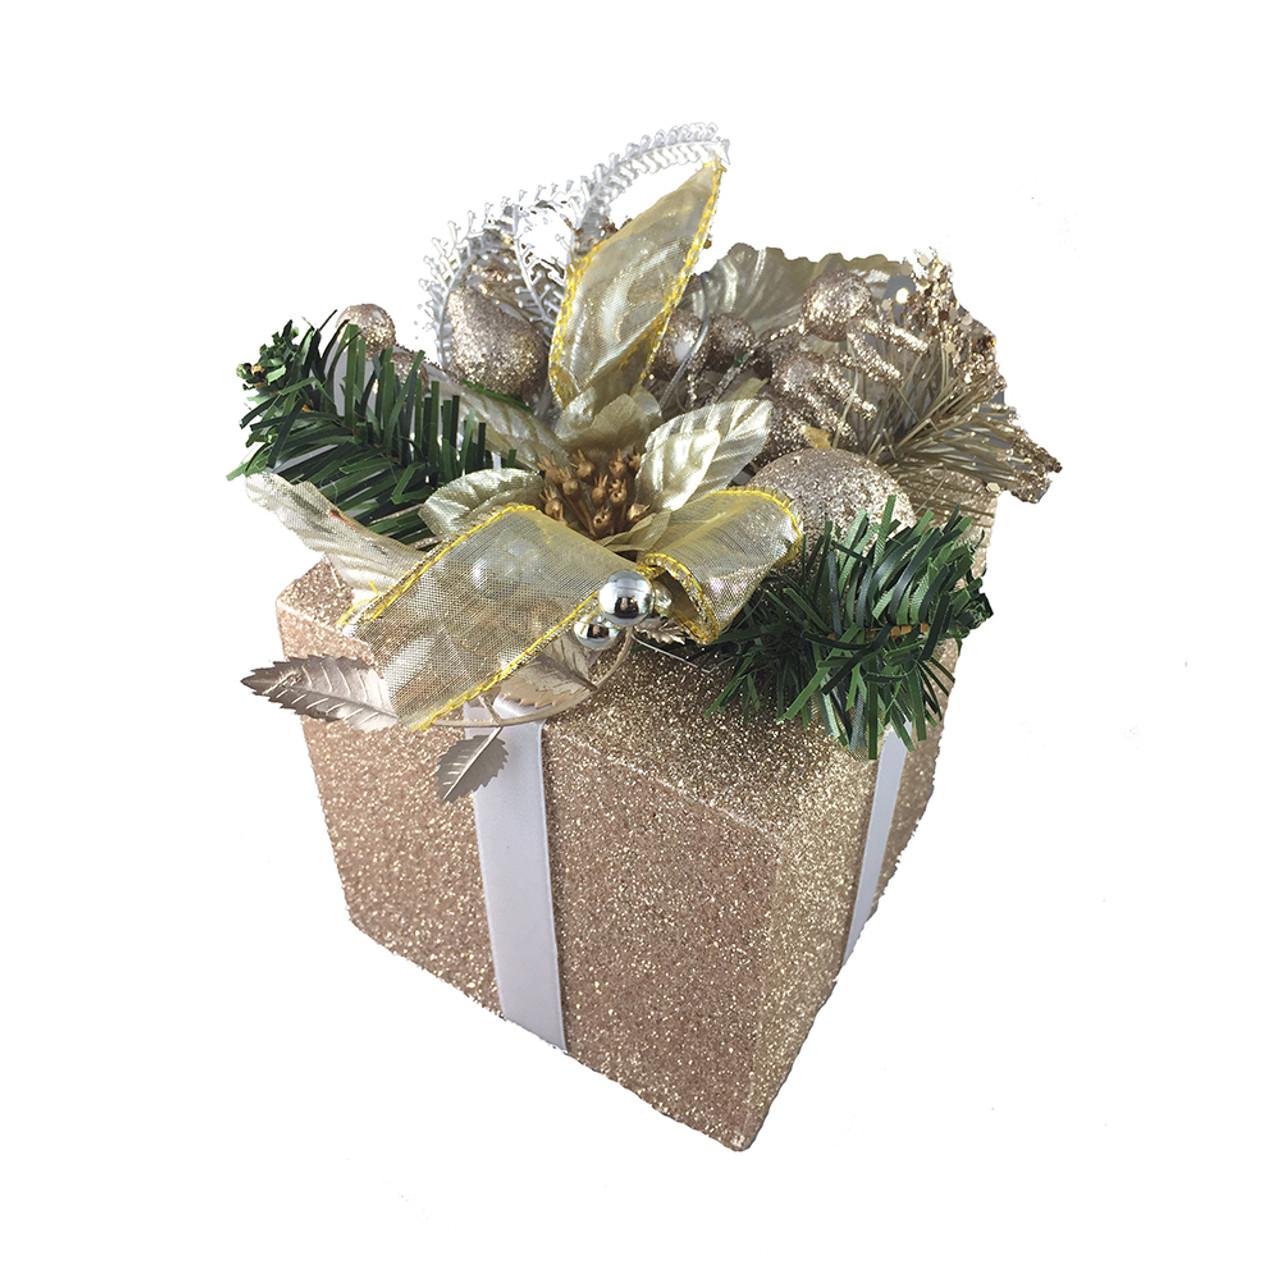 Champagne Christmas Gift Box Decoration